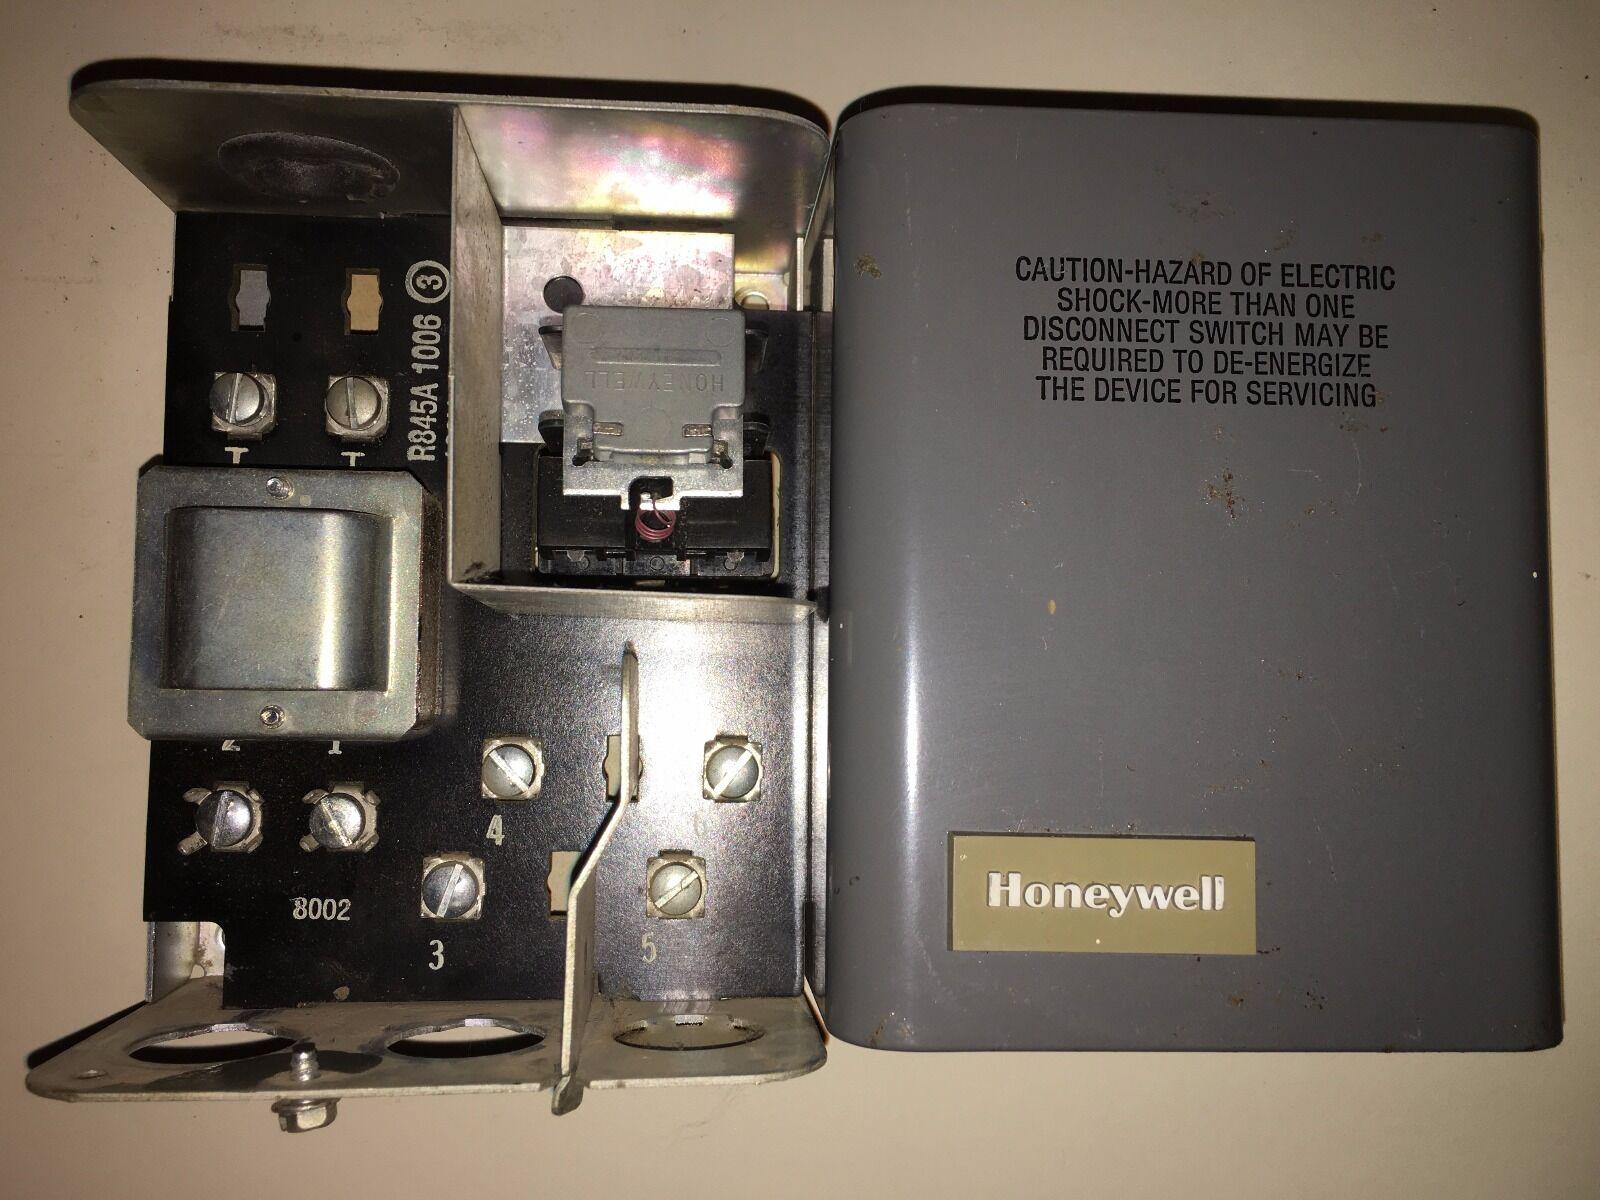 honeywell boiler aquastat wiring diagram gm g body r845 29 images